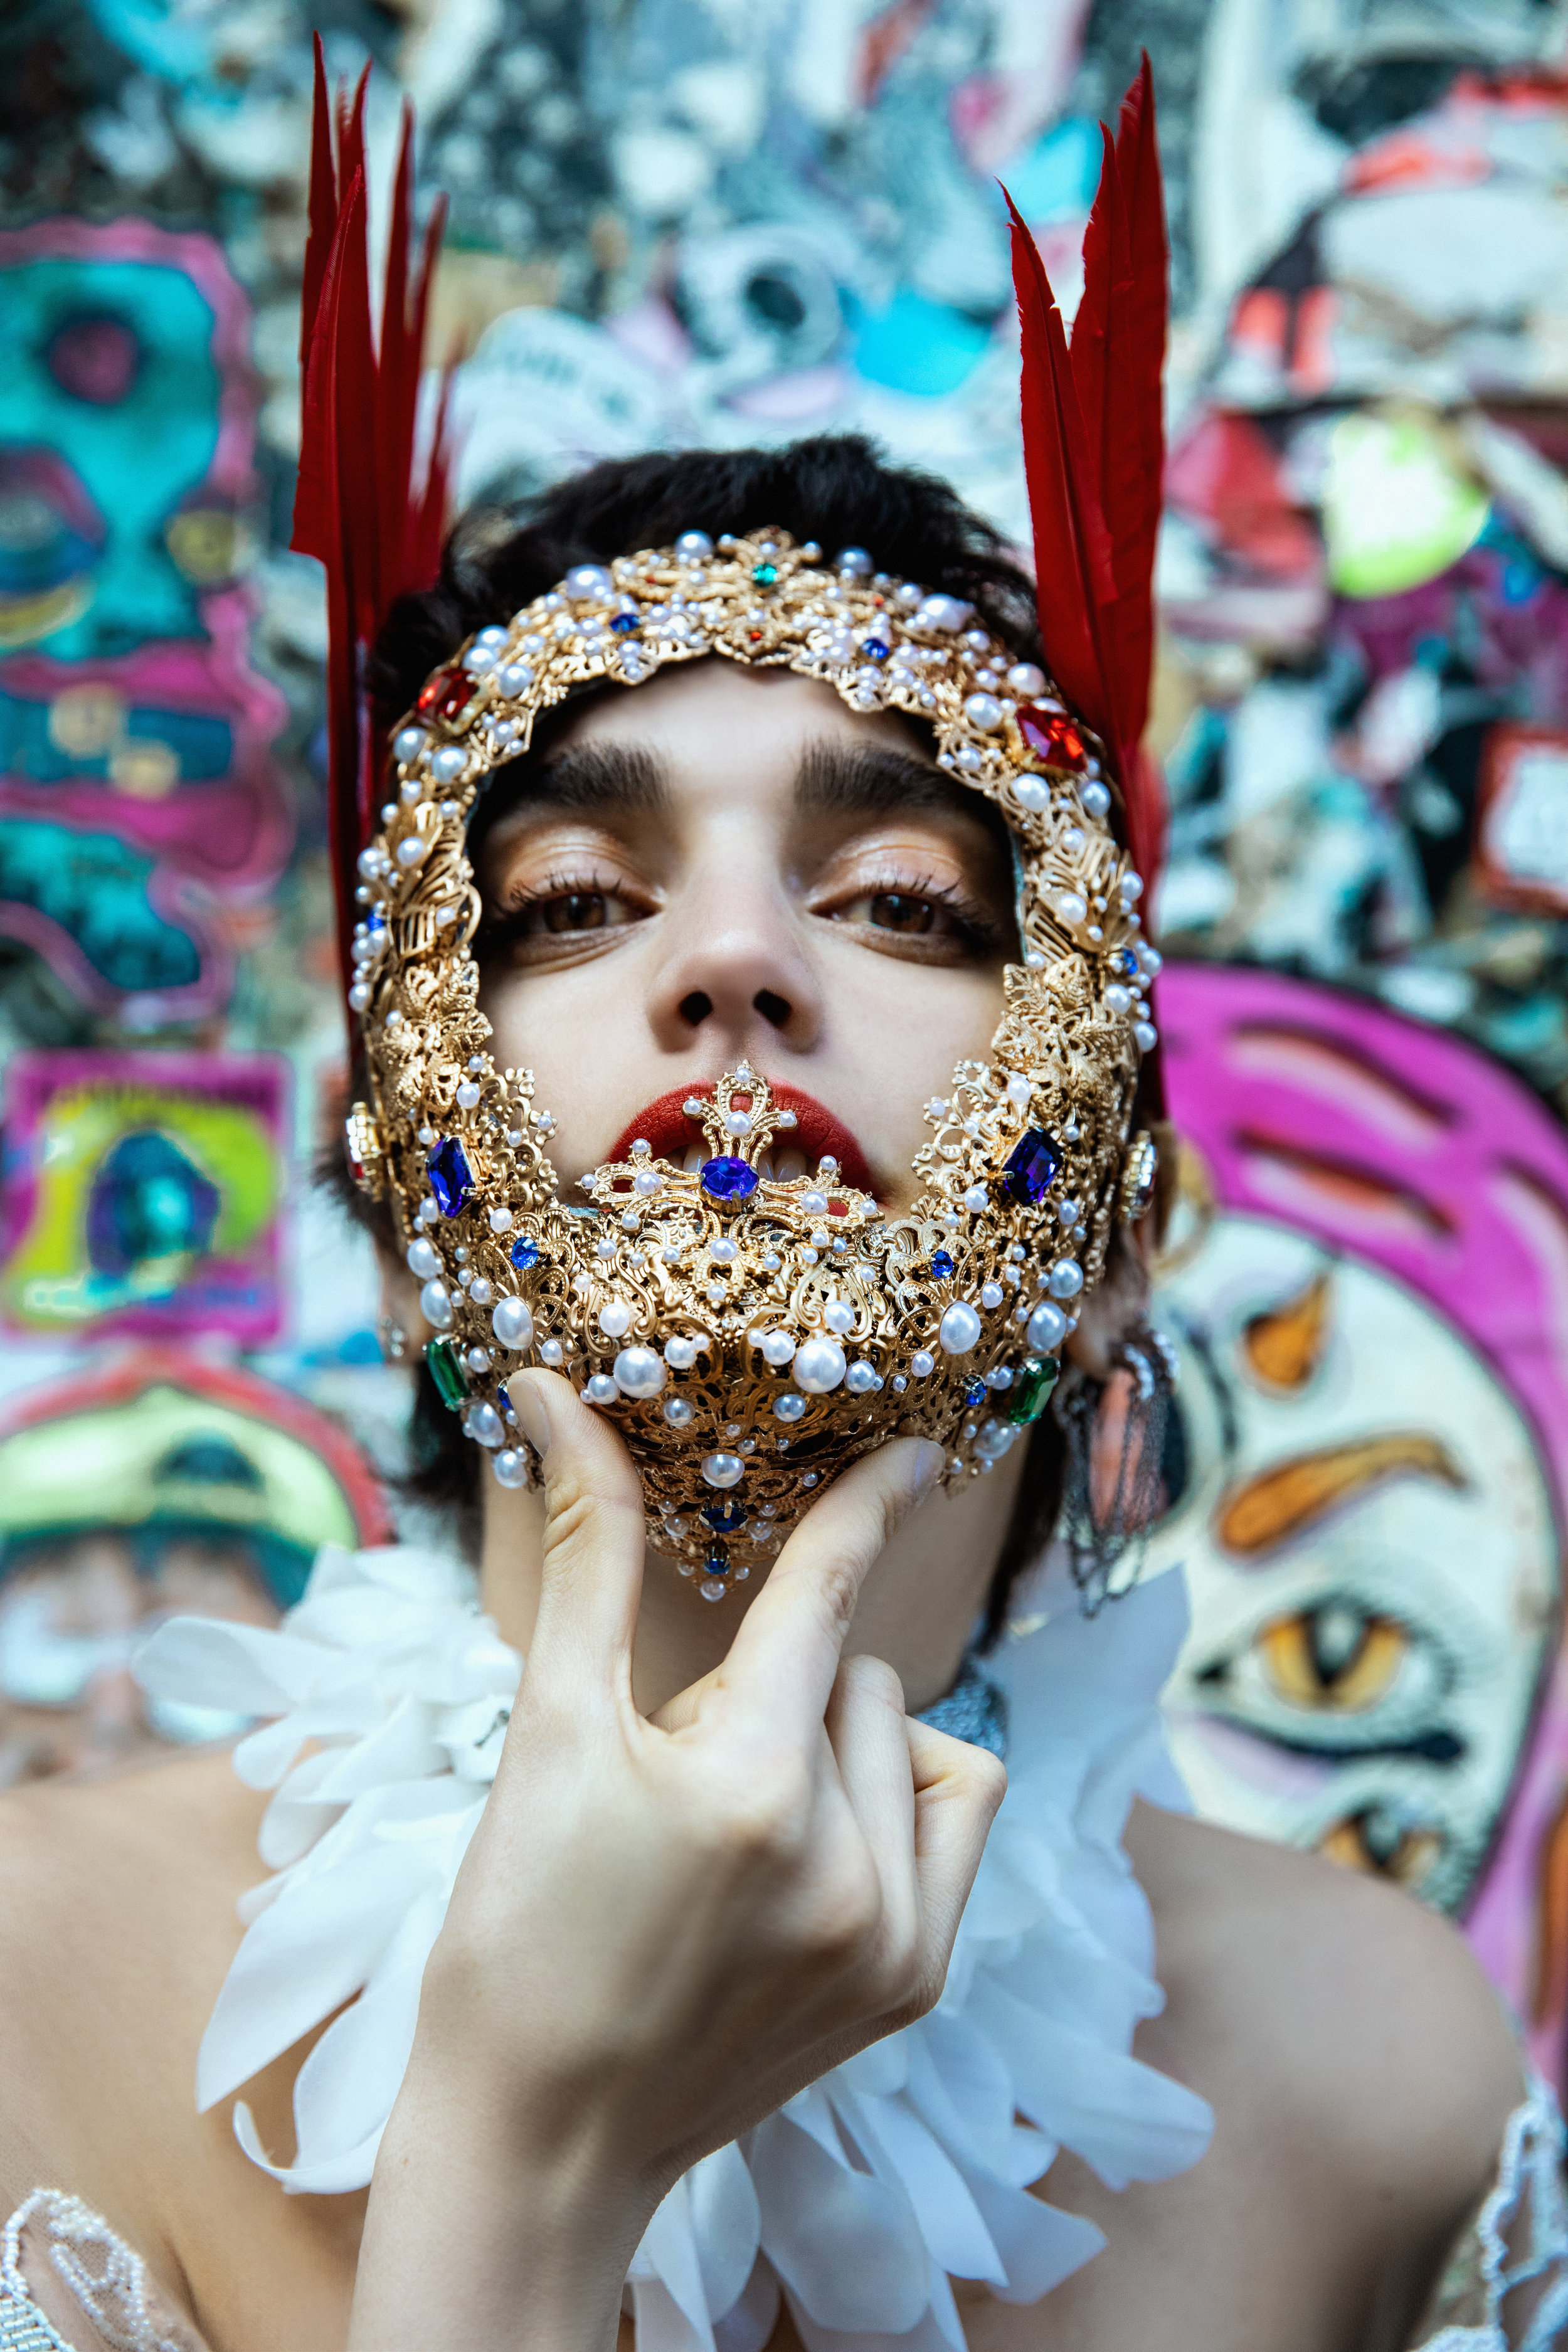 Dress ALENA AKHMADULLINA. Mask LORY SUN. Feathers MIODRAG GUBERINIC. Necklace PRESTON & LINNIE